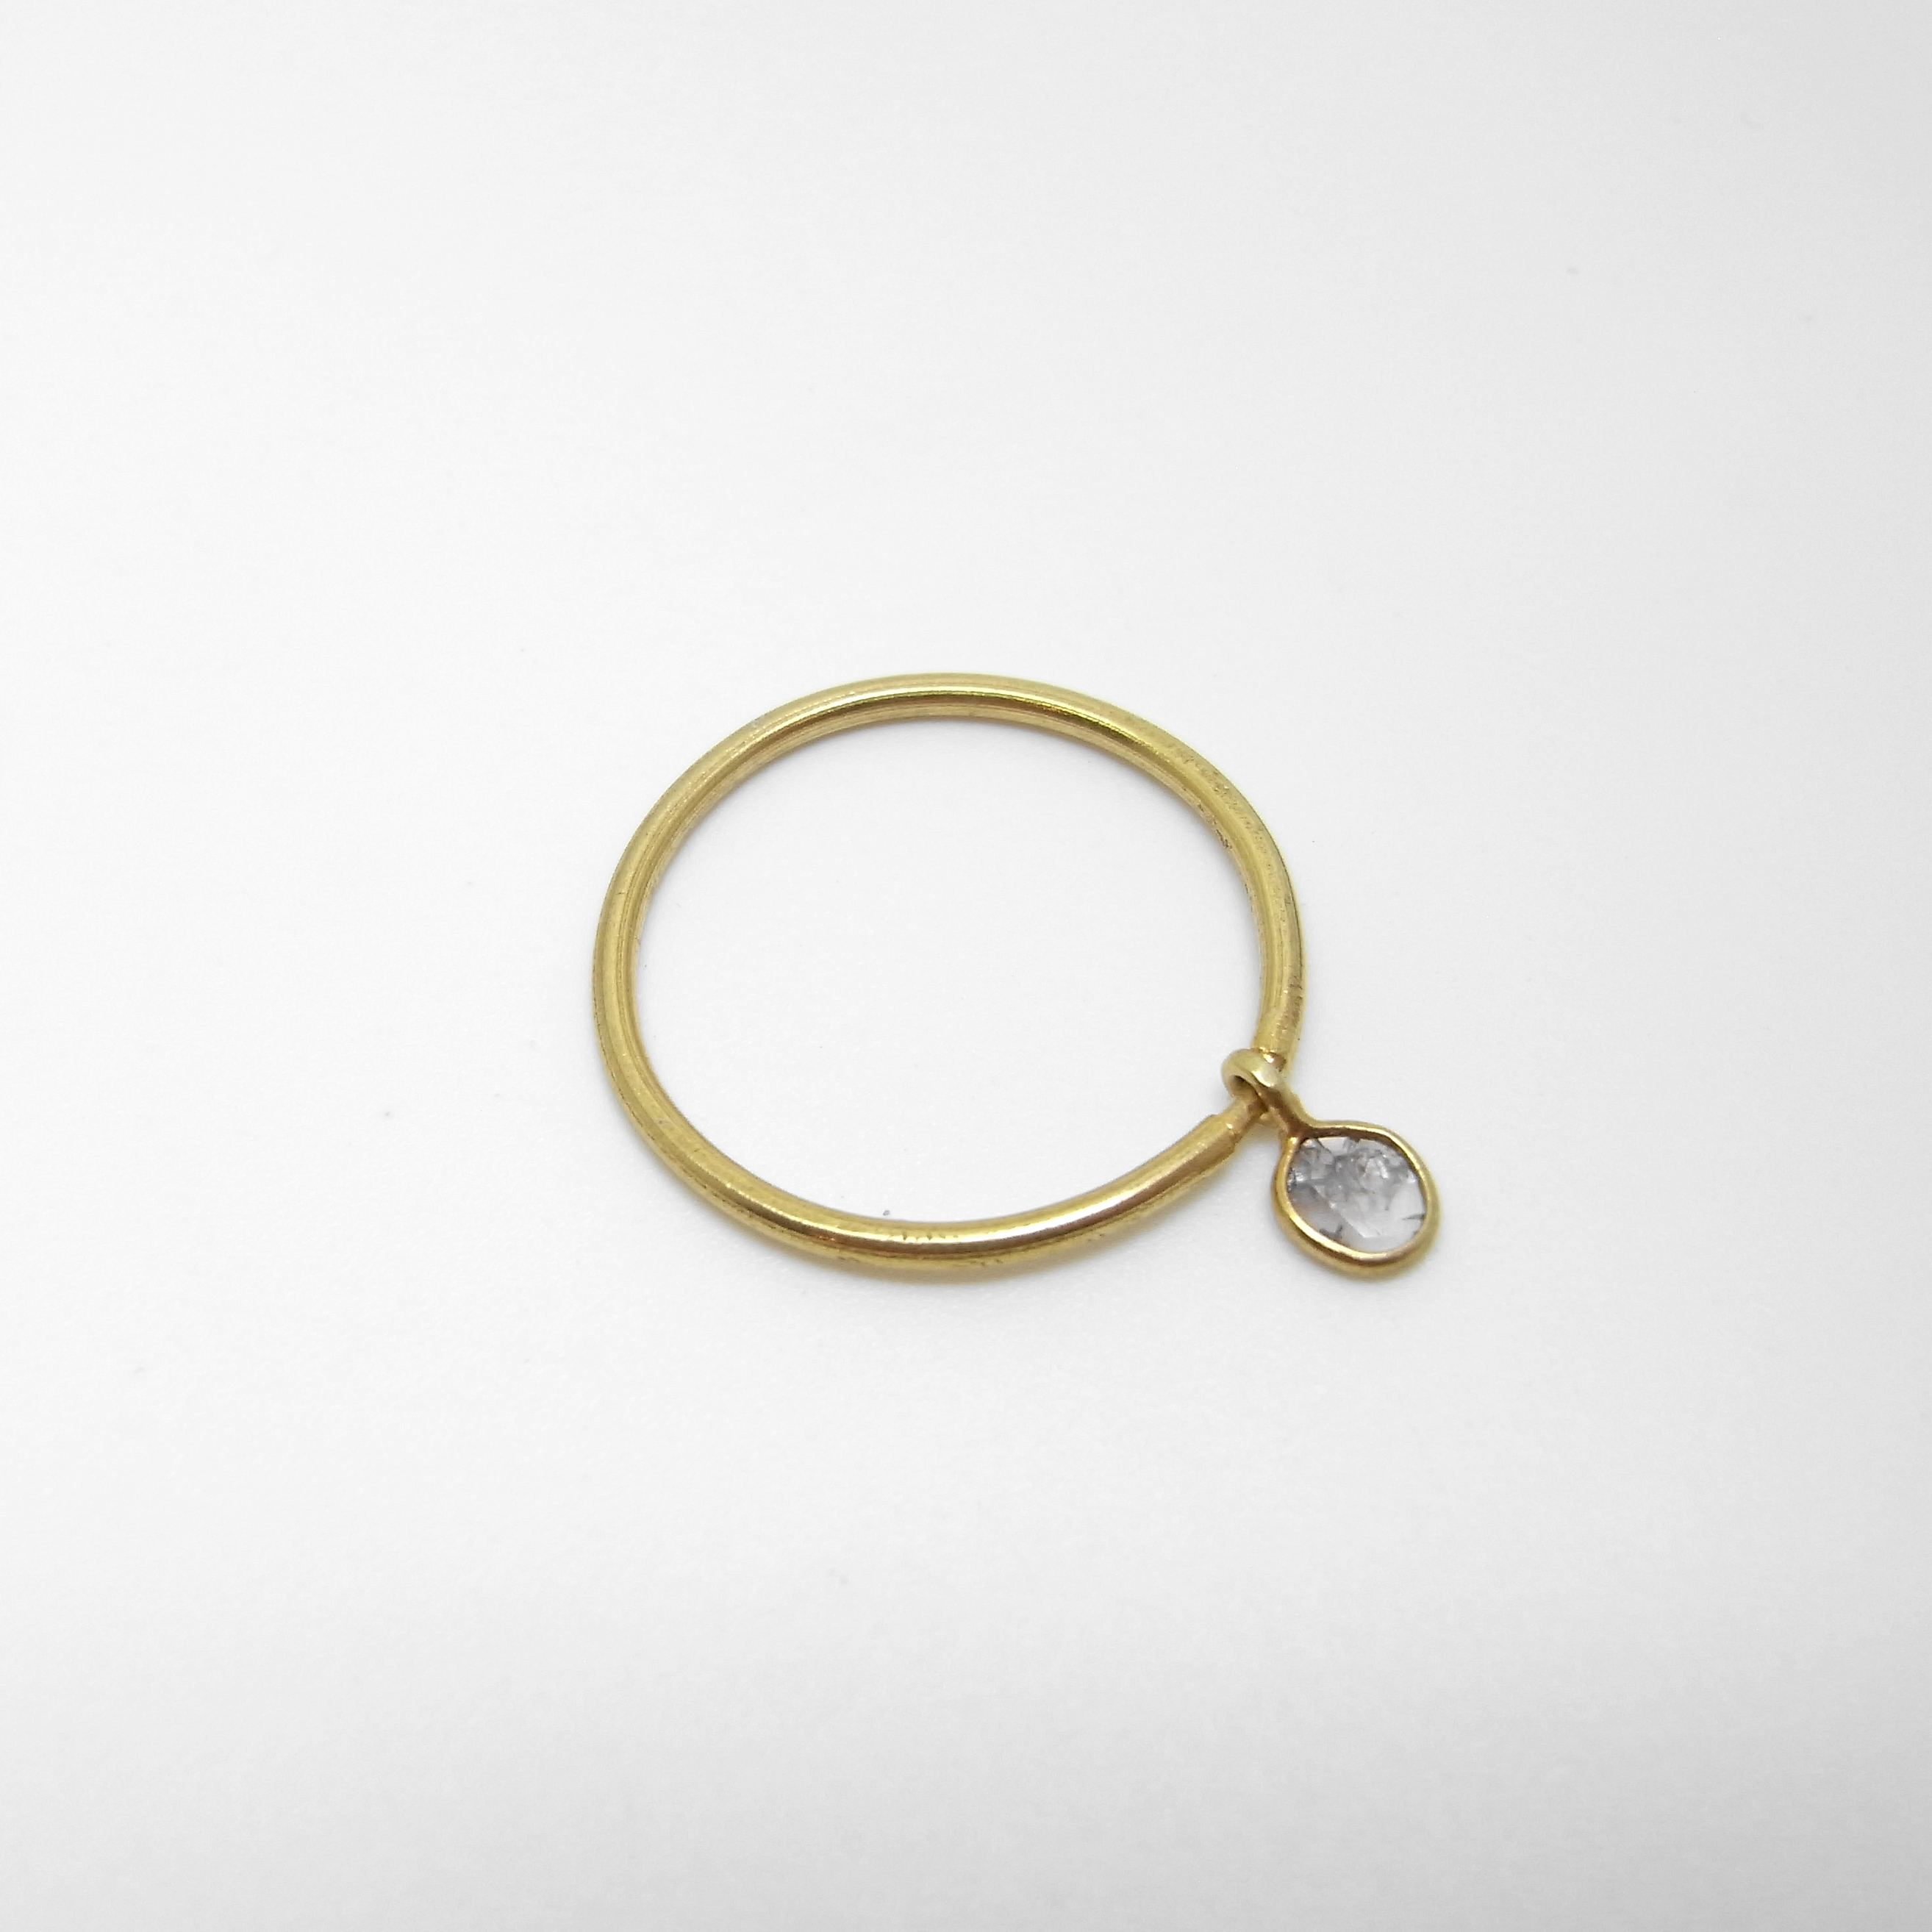 Ring with Diamond Charm